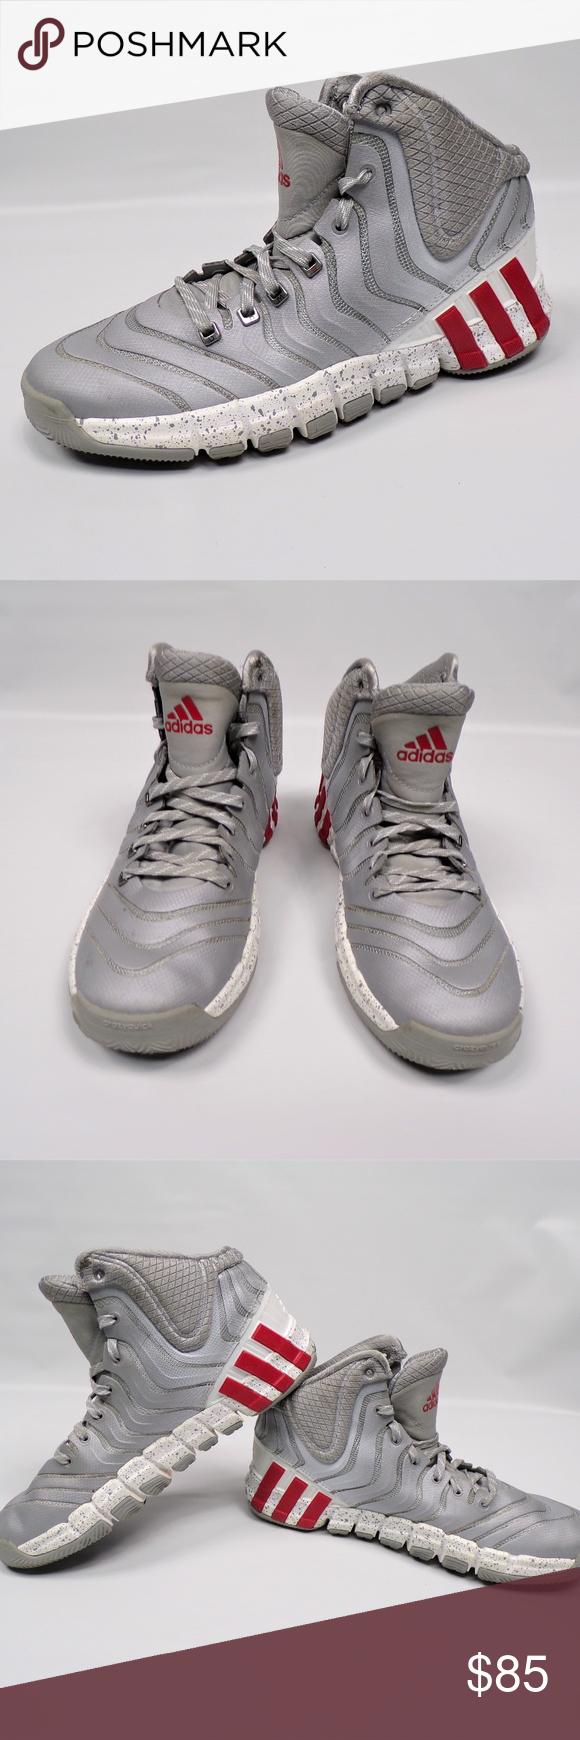 ADIDAS ADIPURE CRAZYQUICK 2 Damian Lillard Basketball Schuhe